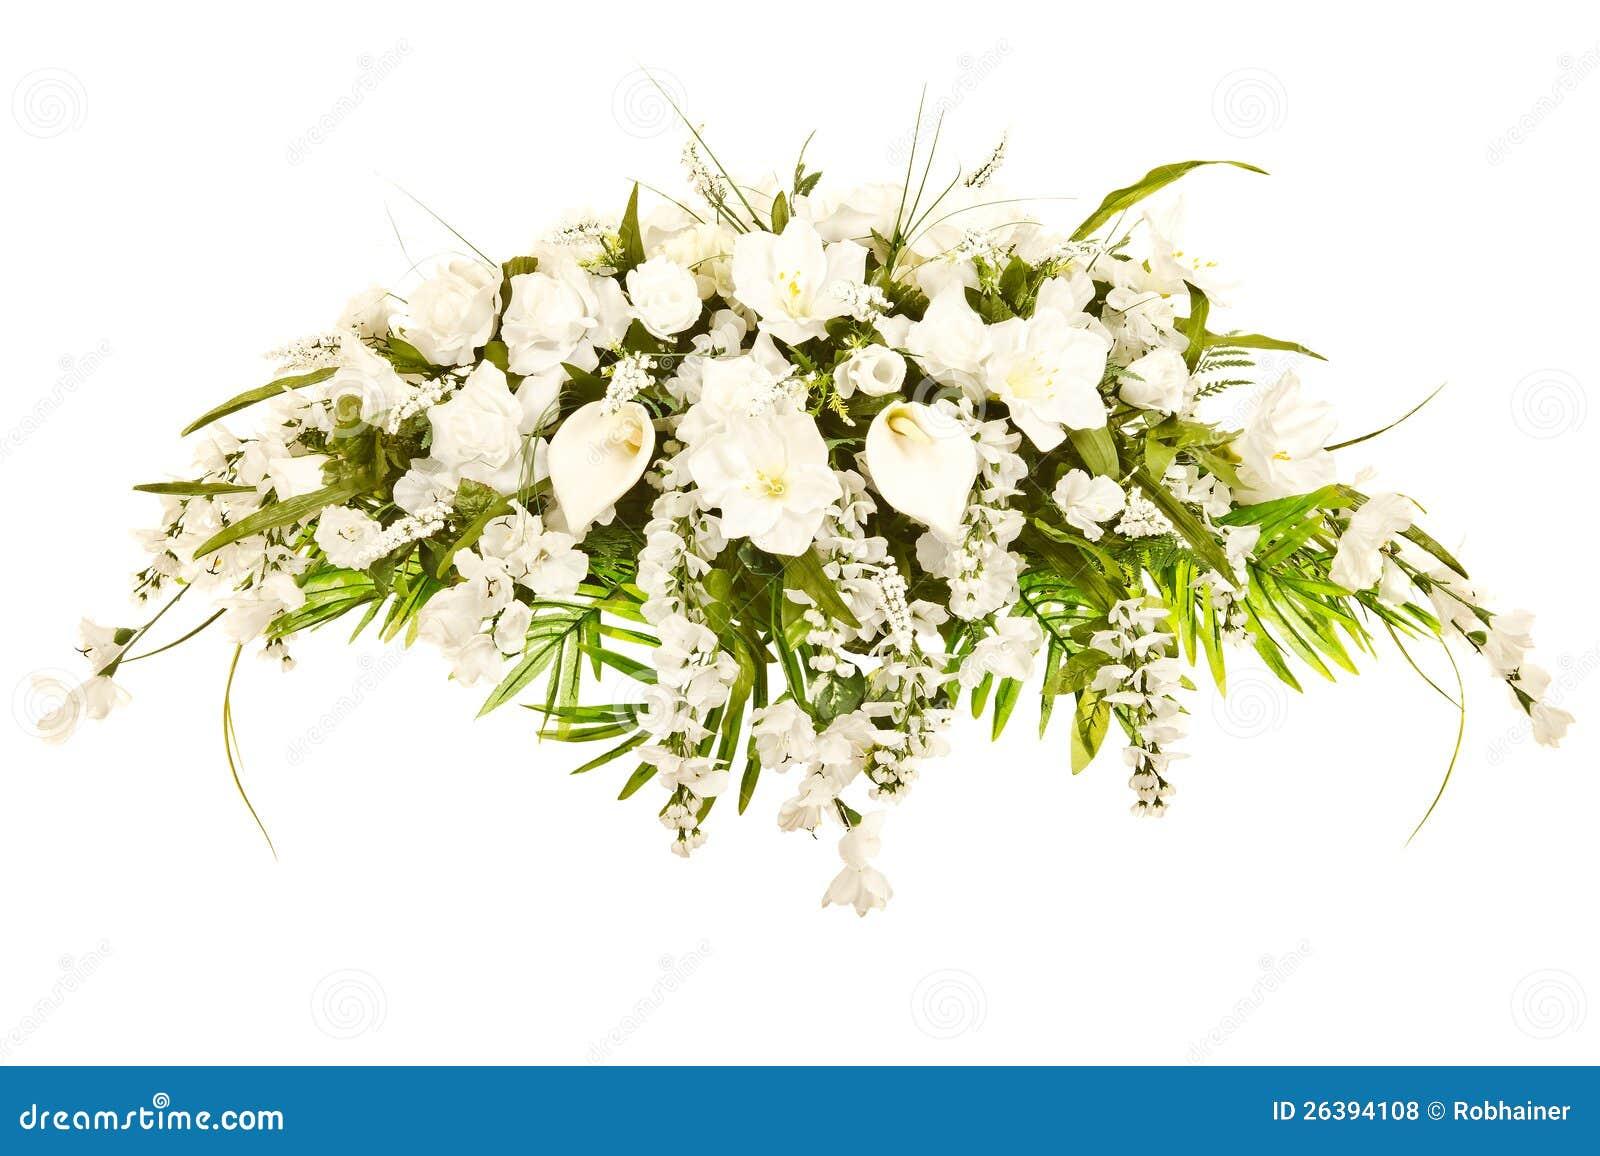 Silk Casket Cover Funeral Floral Arrangement Royalty Free Stock Photos ...